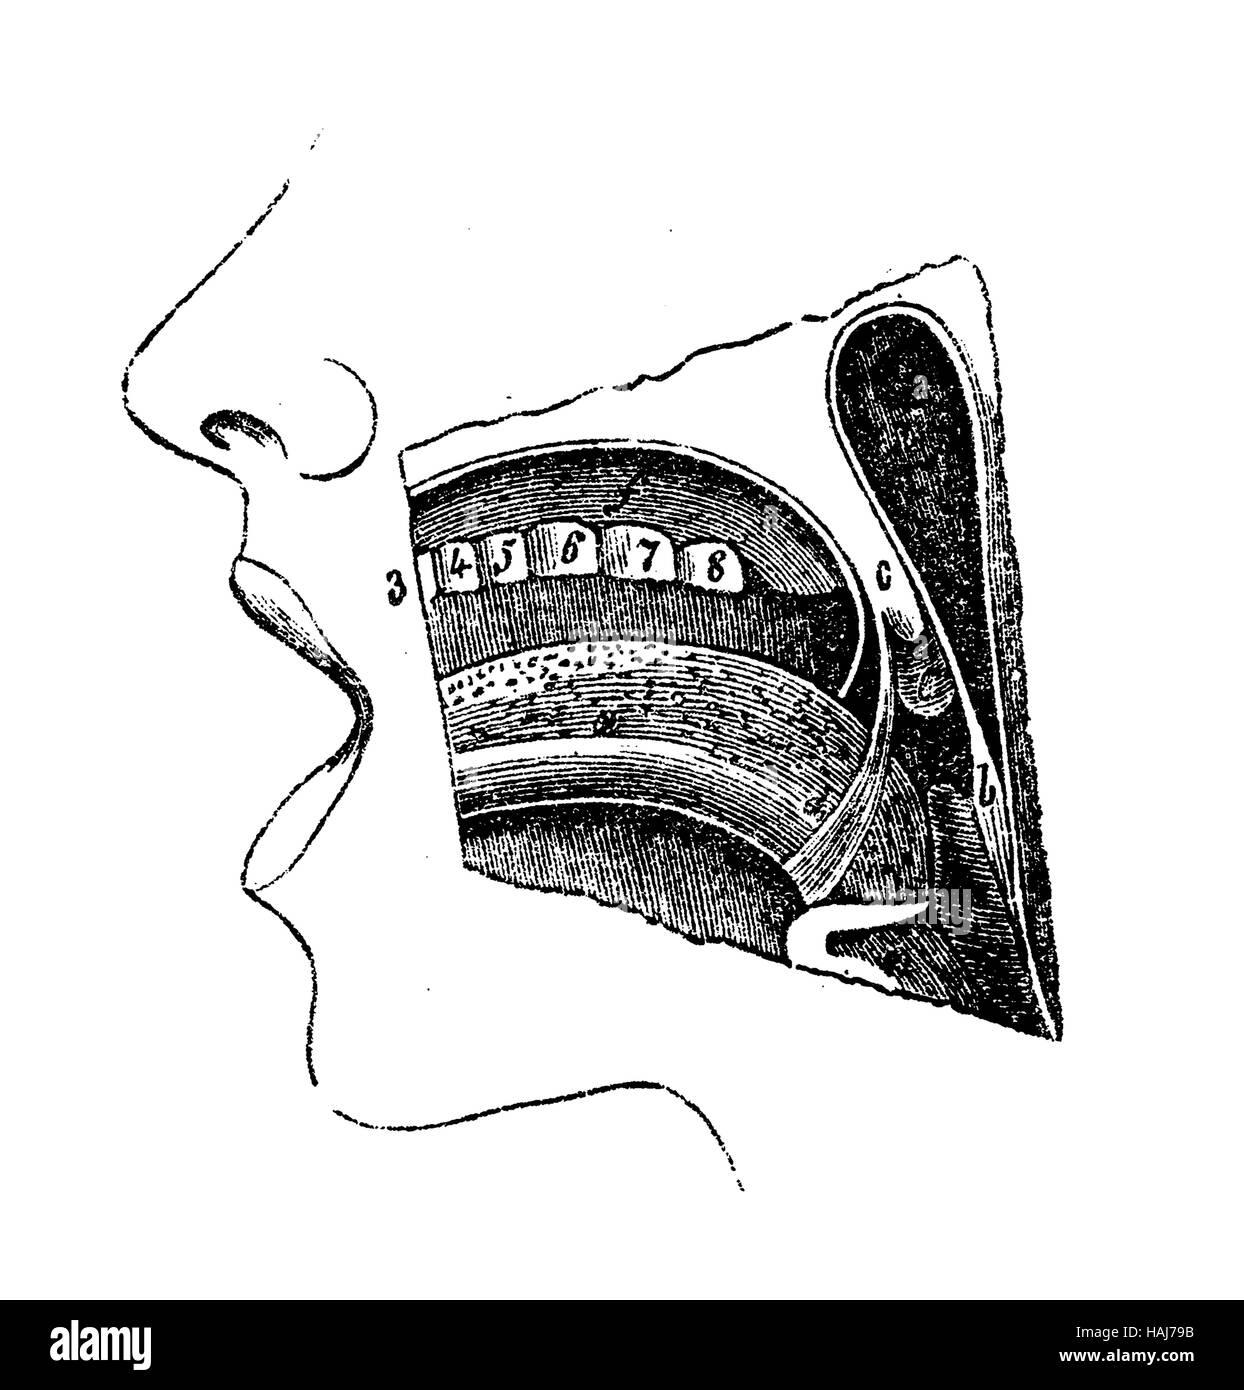 Anatomy Of Human Tongue Stockfotos & Anatomy Of Human Tongue Bilder ...